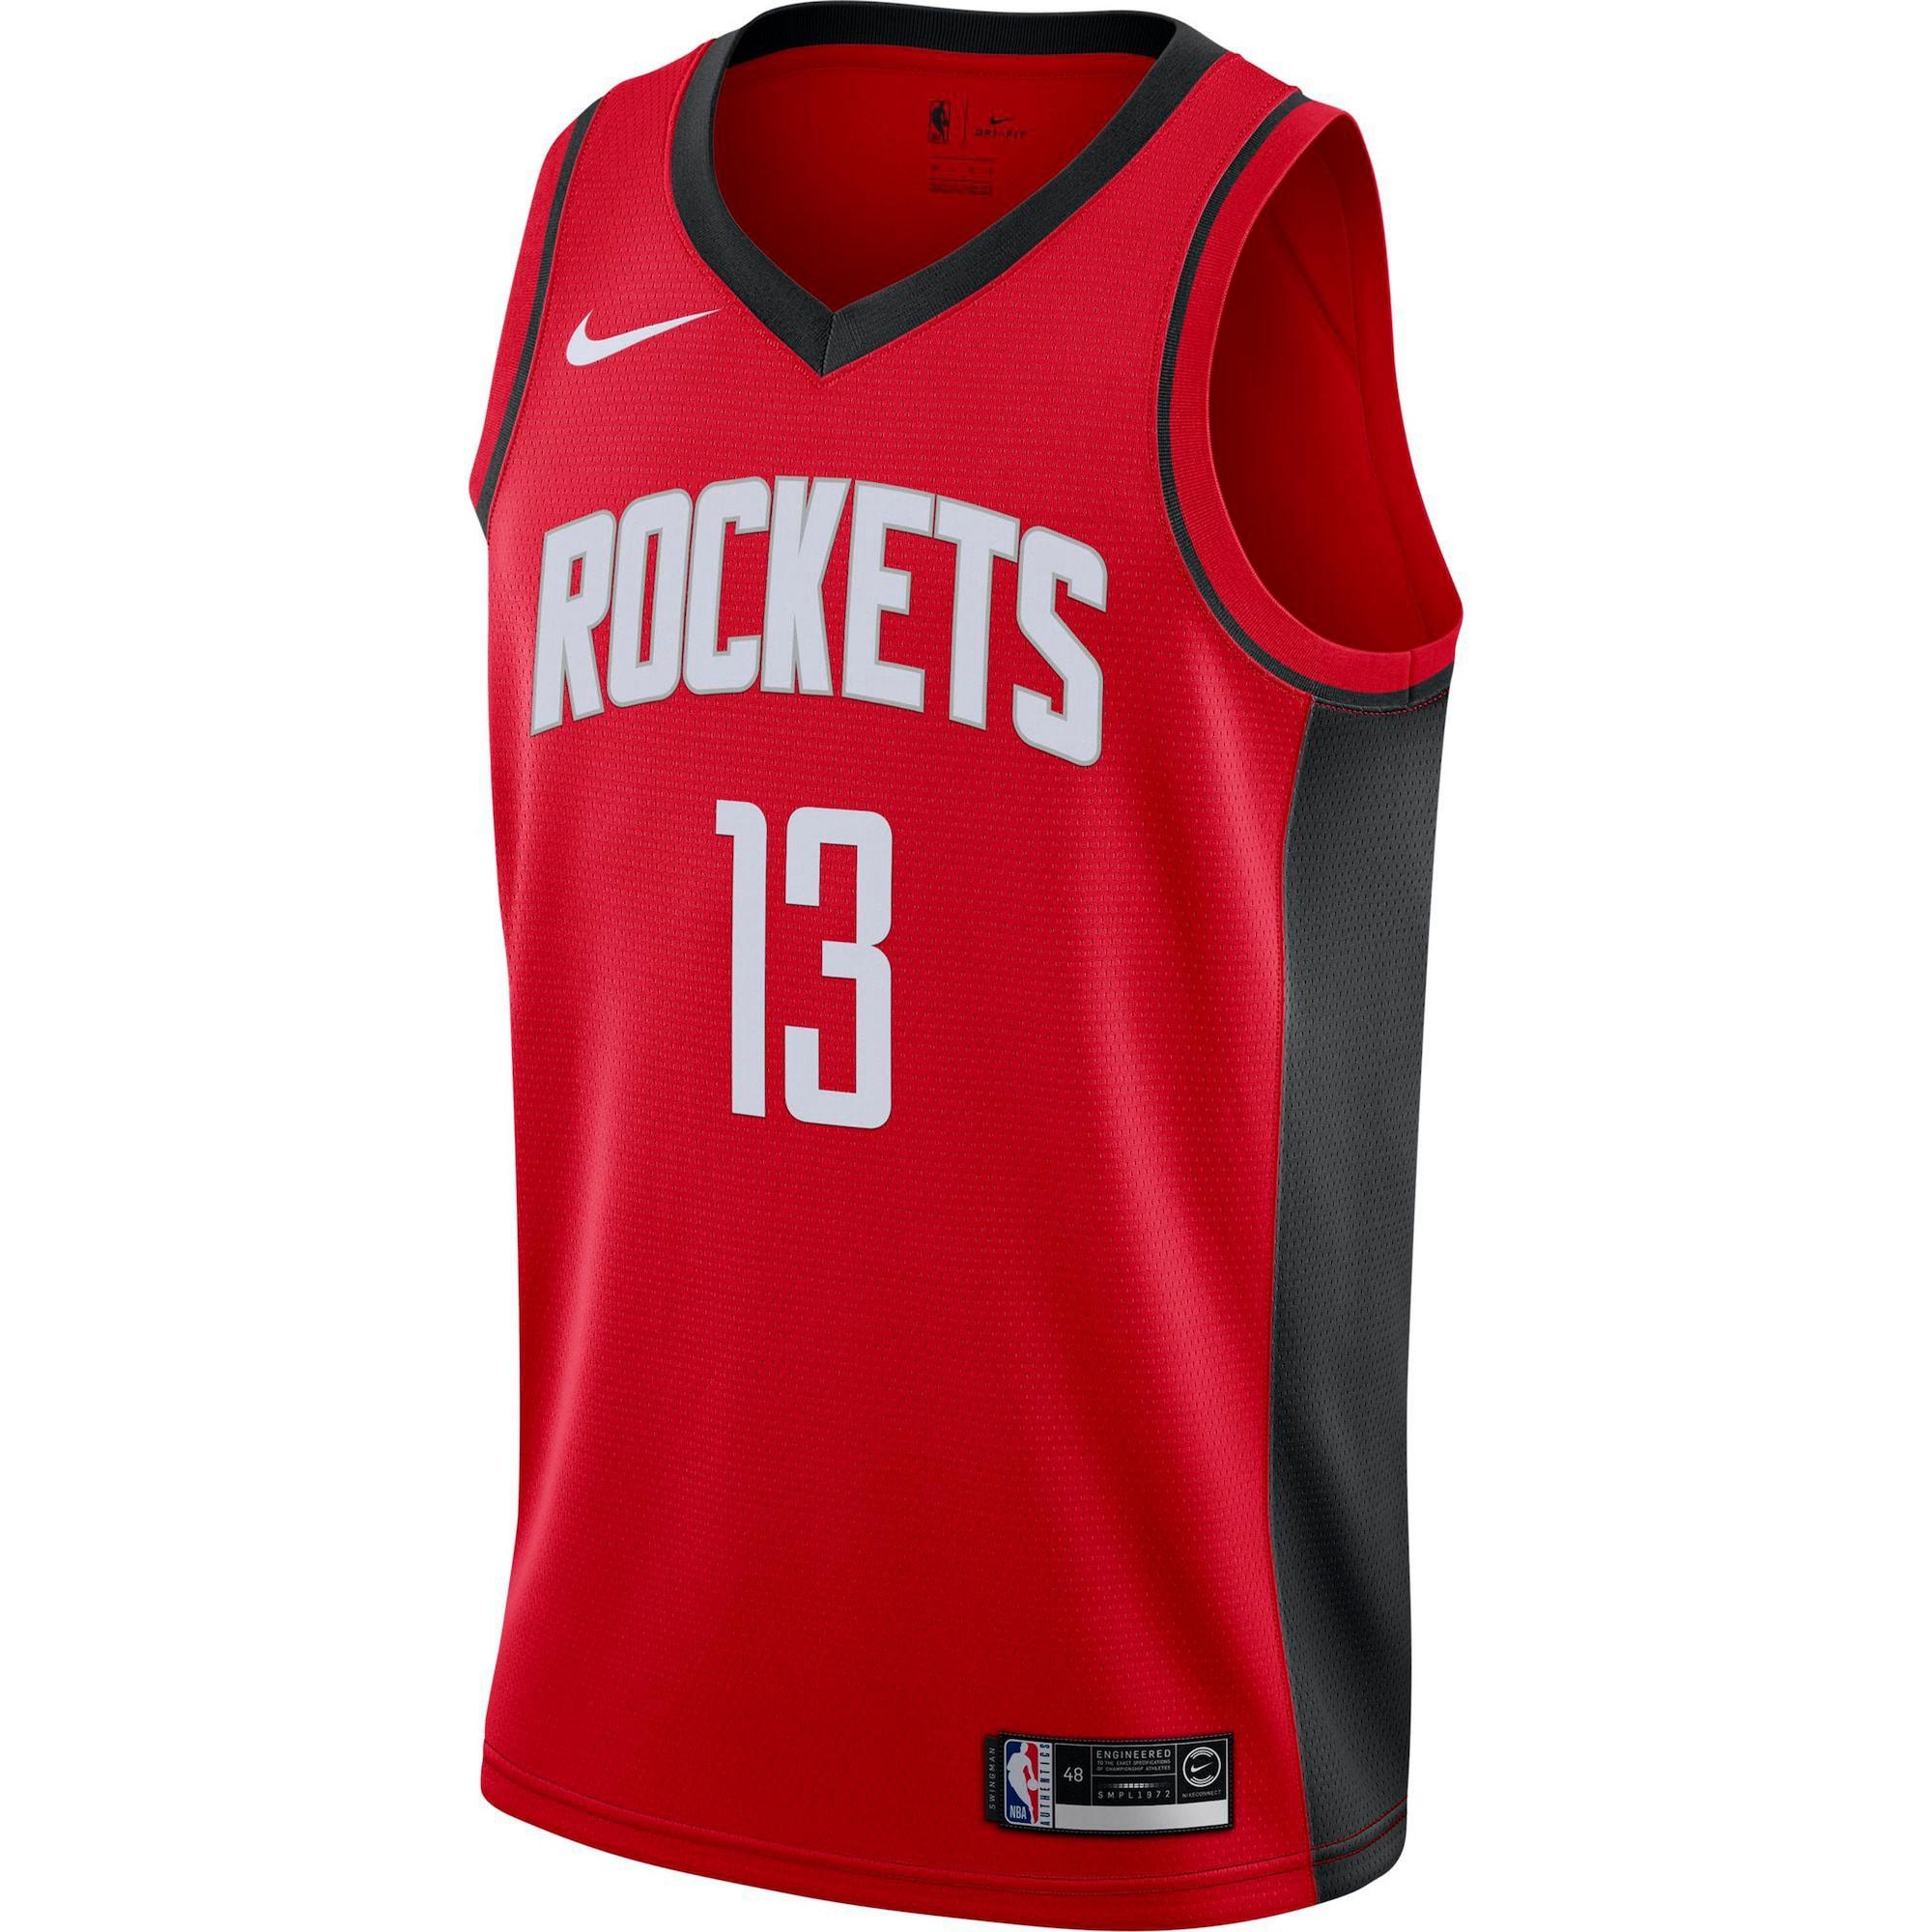 Basketballtrikot 'Harden James Houston Rockets' | Sportbekleidung > Trikots > Basketballtrikots | Nike